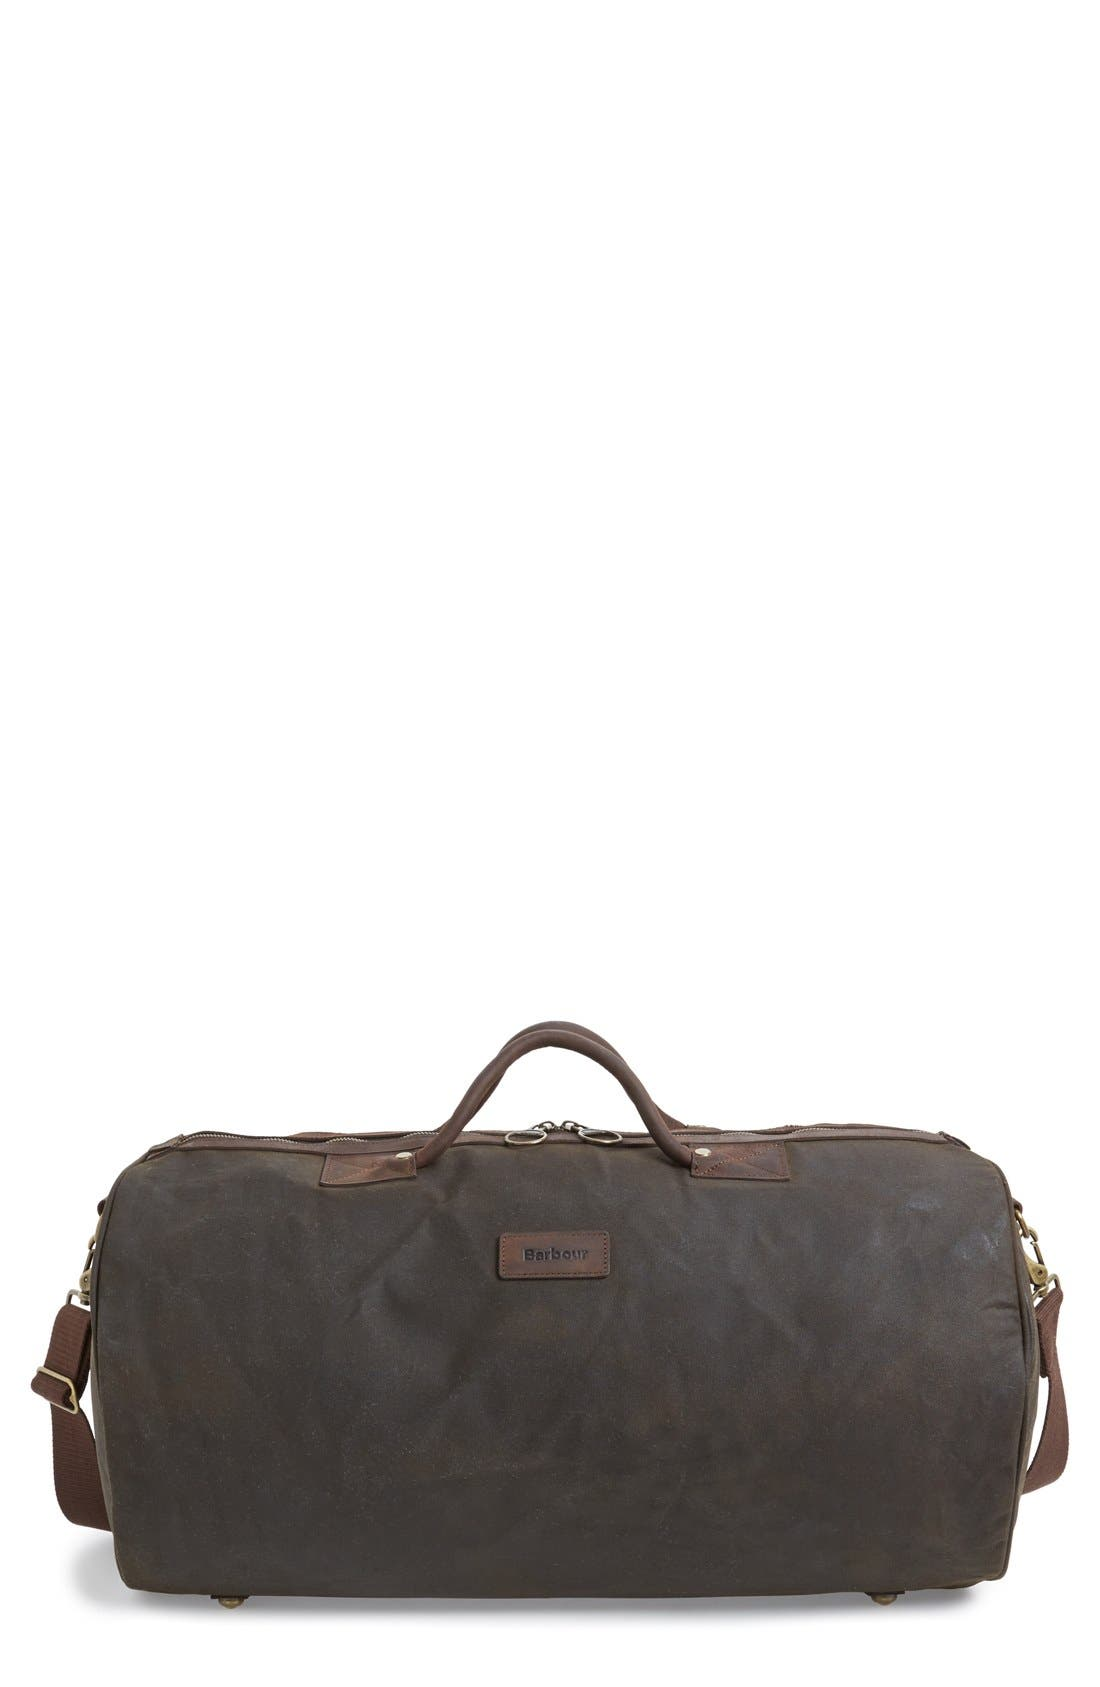 Waxed Canvas Duffel Bag,                         Main,                         color, 340